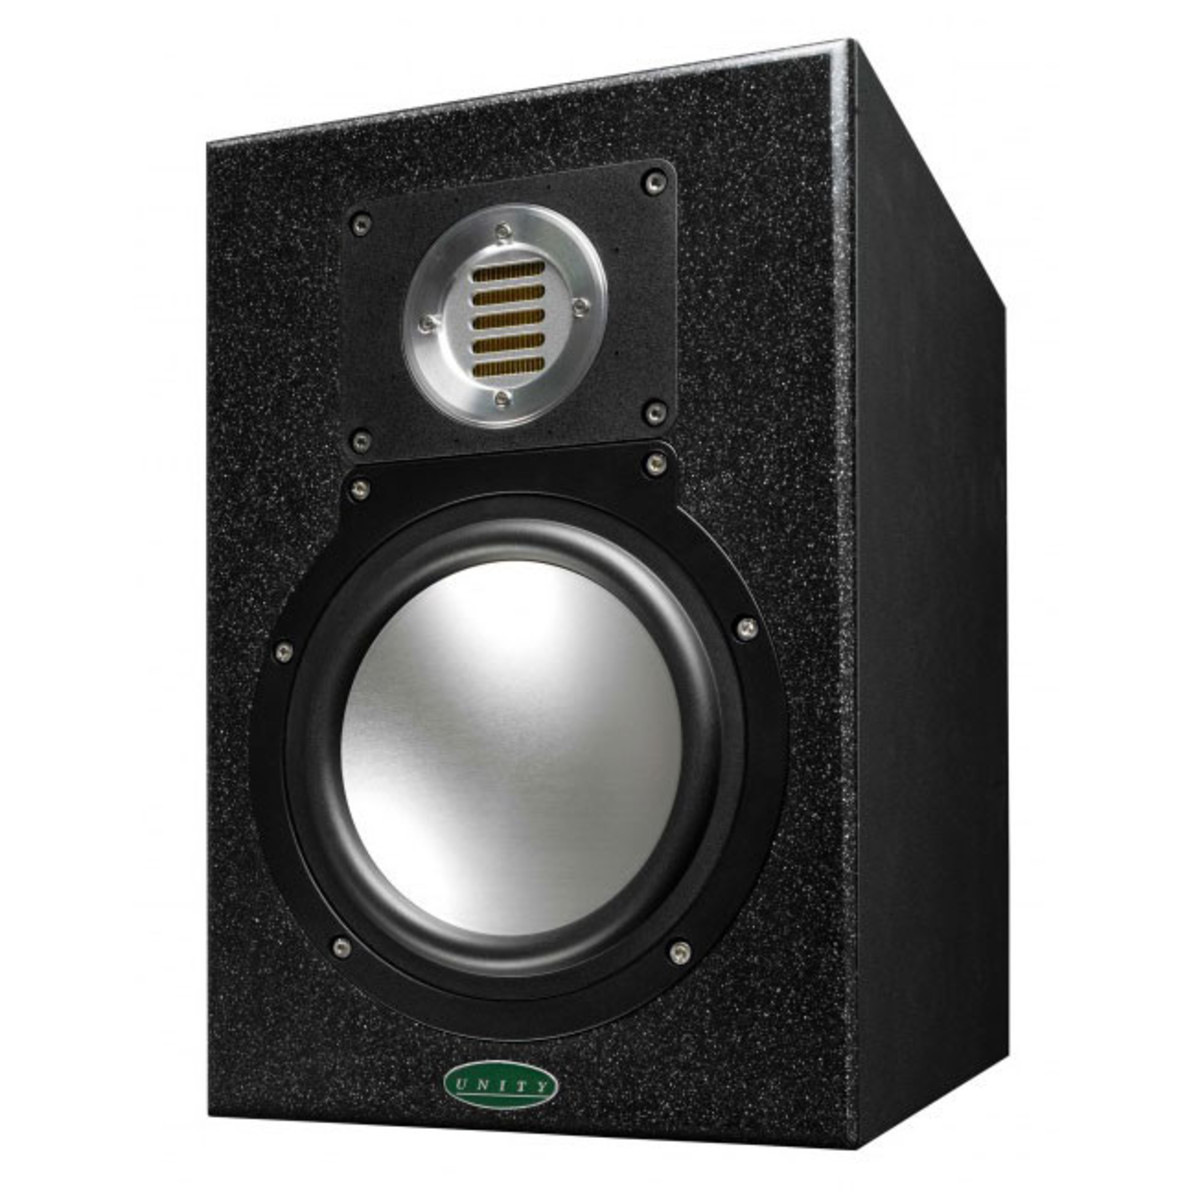 Two Way Audio Monitor : Unity audio the rock mkii active way monitor at